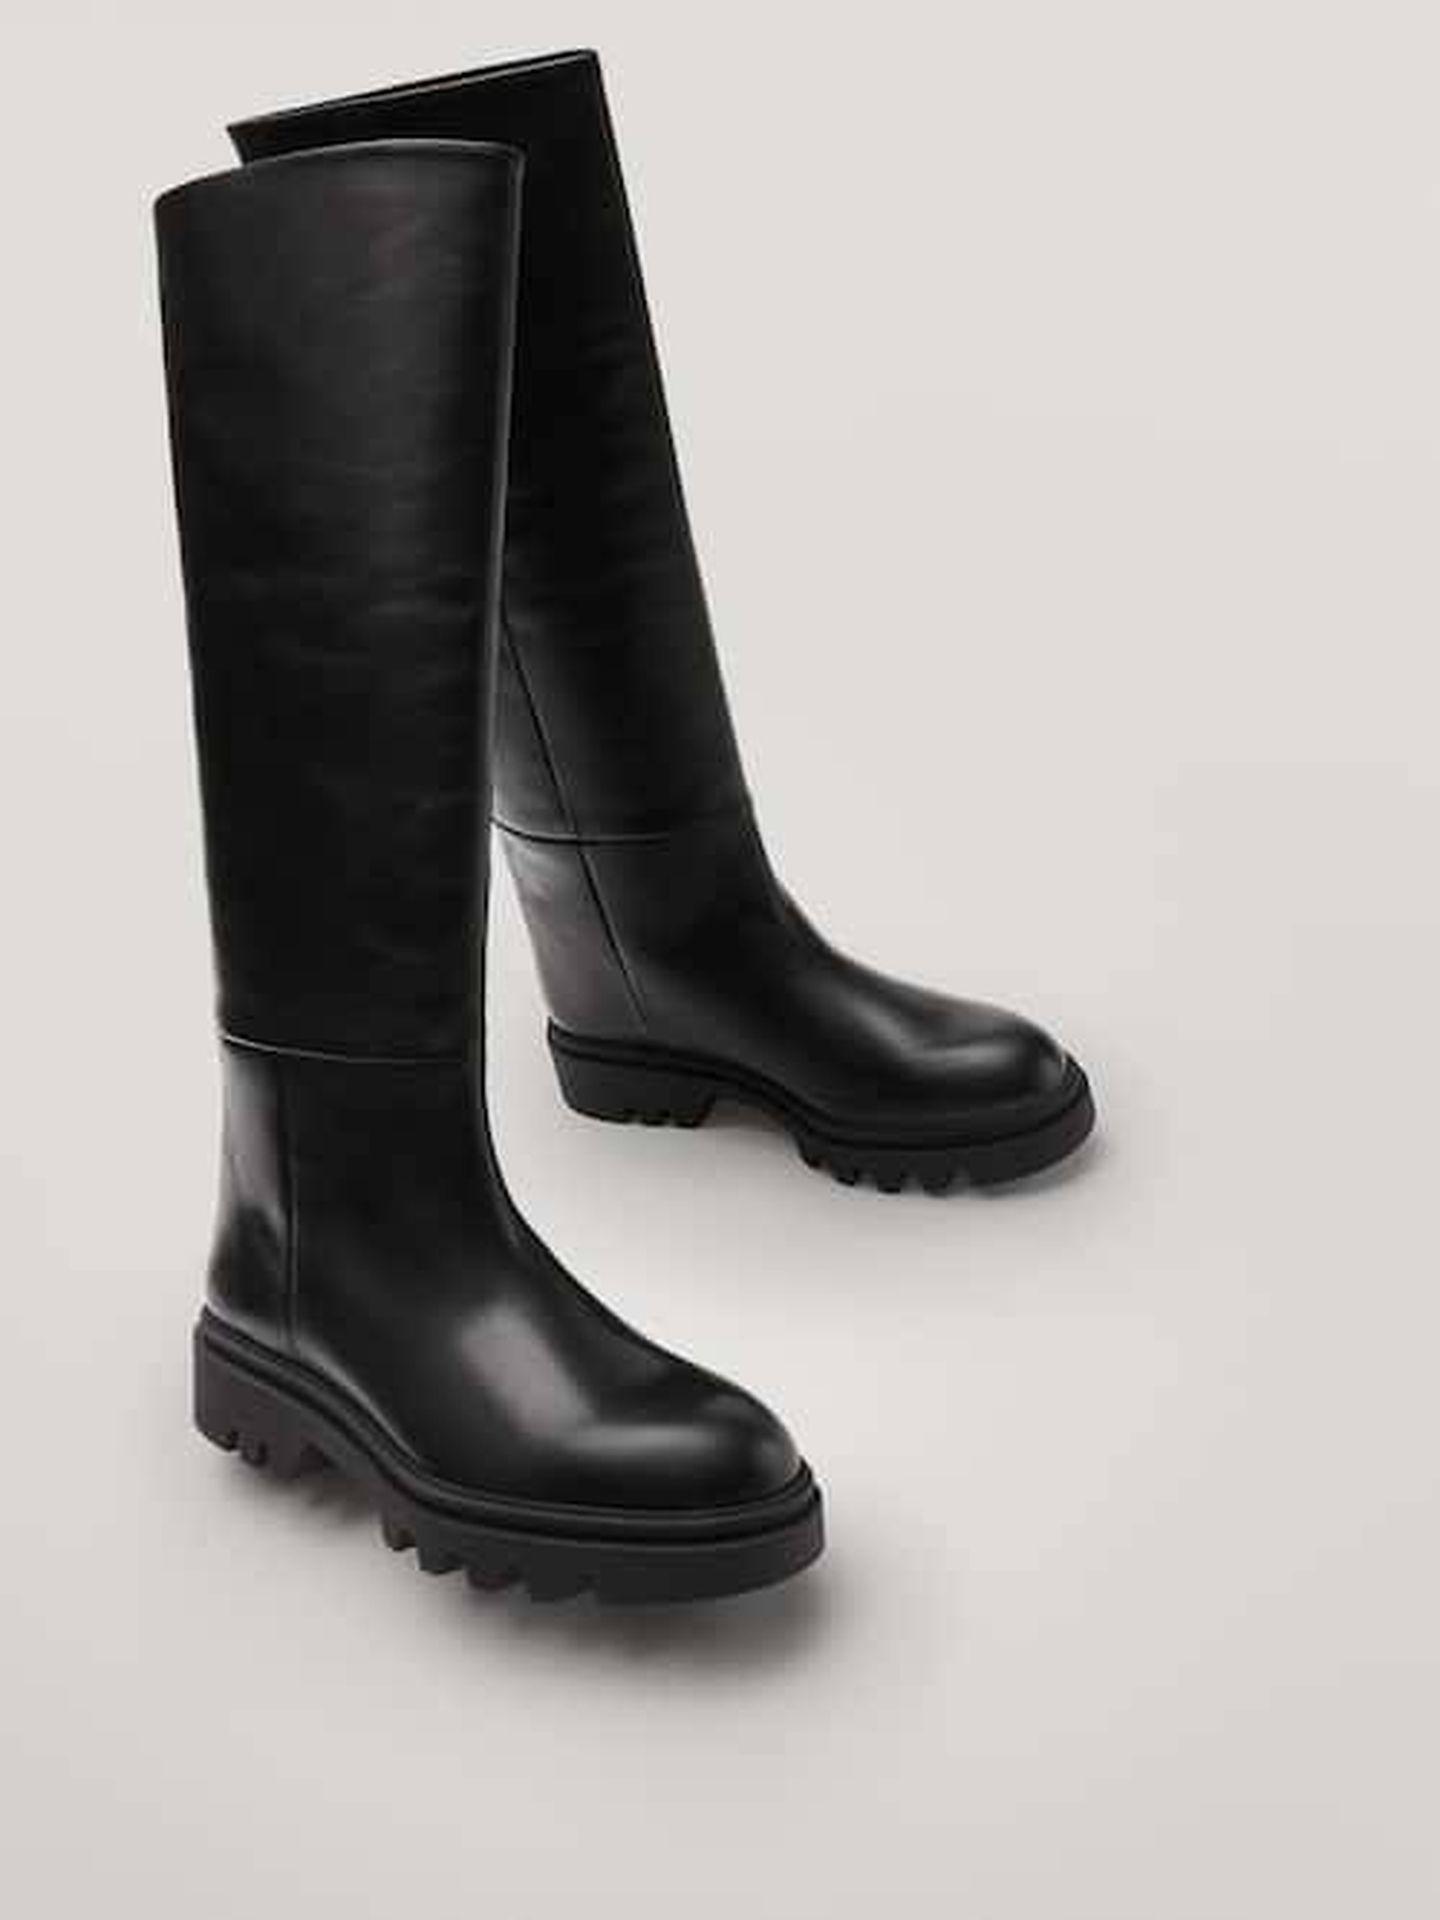 Las botas de Massimo Dutti. (Cortesía)